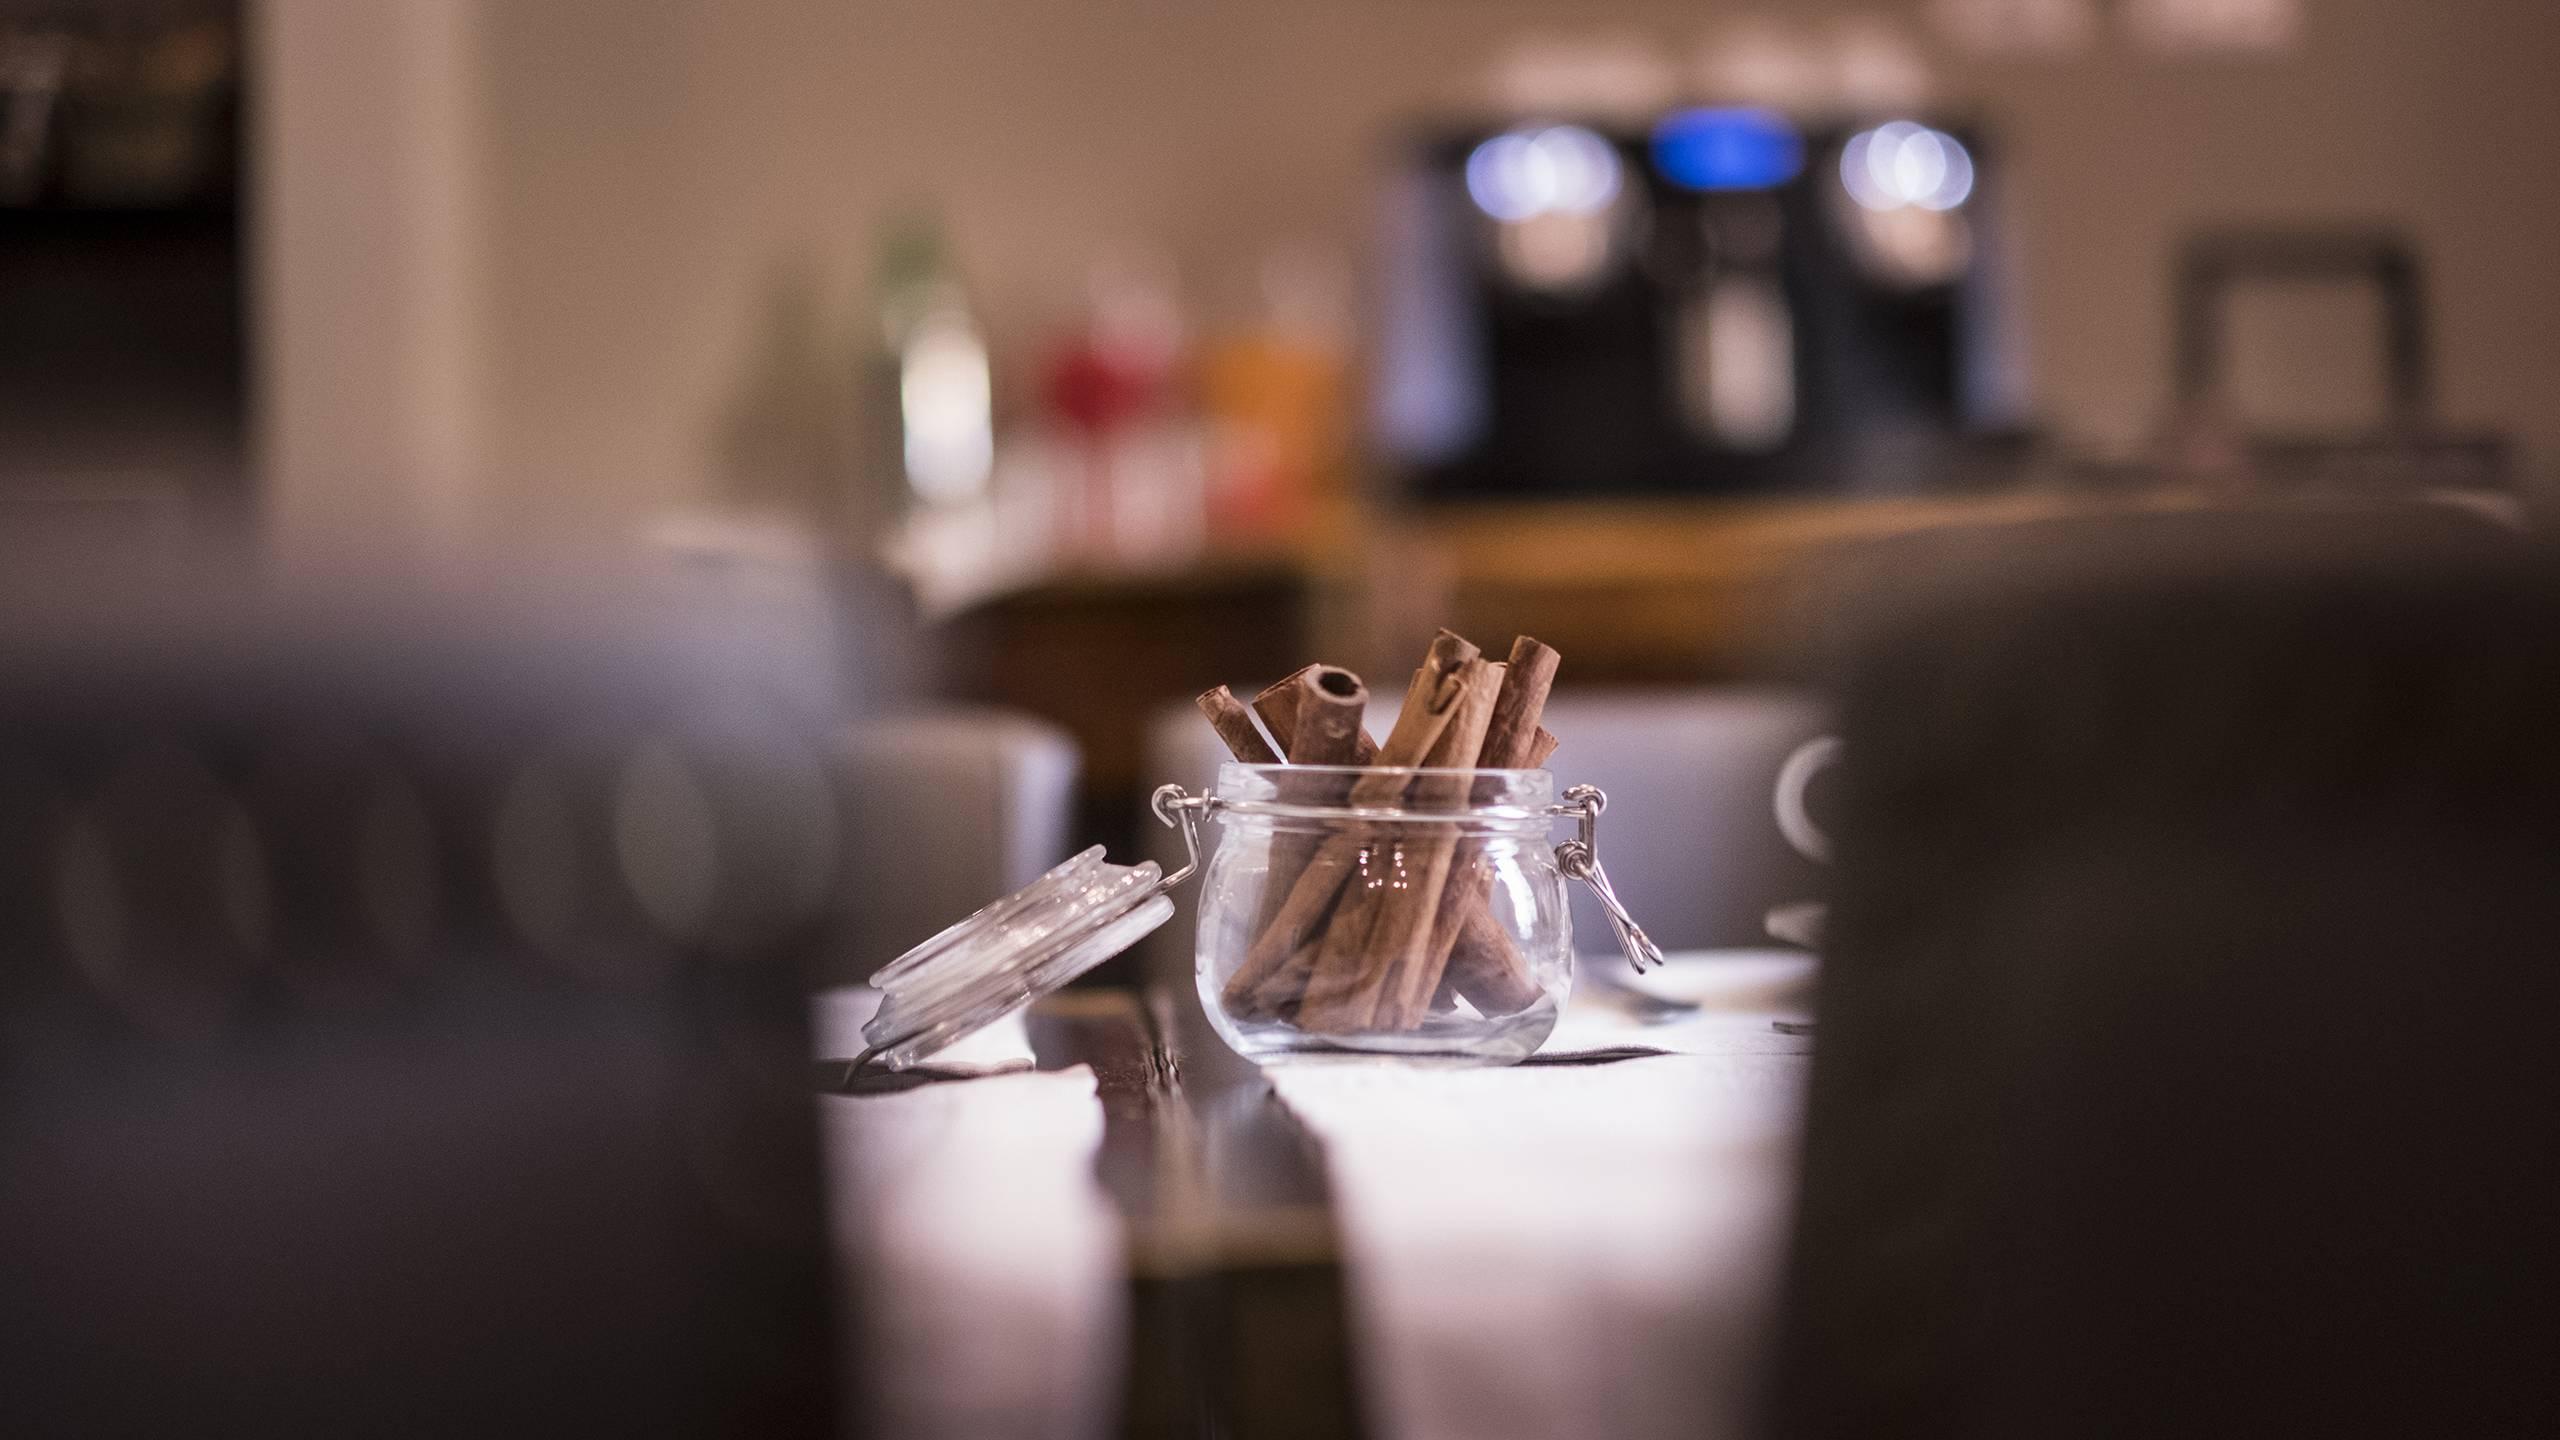 gh-collection-rome-breakfast-room-DSCF2114